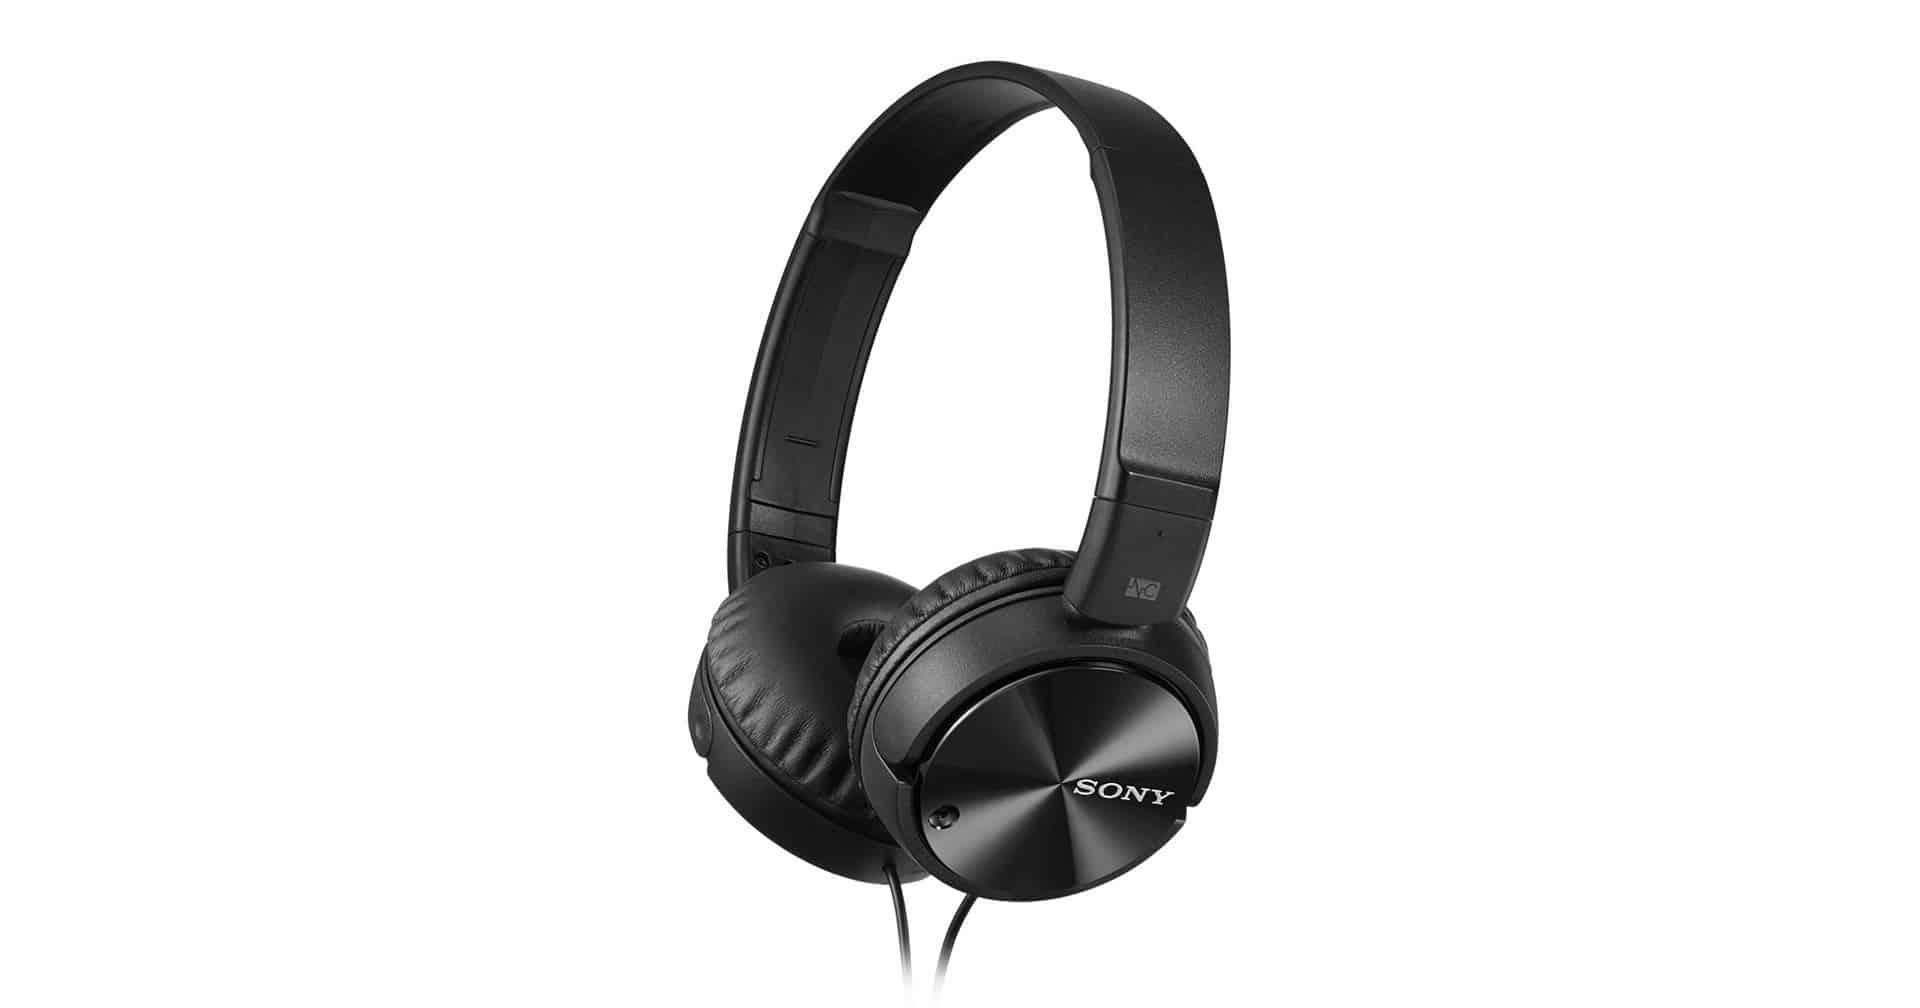 0002664_sony-zx110nc-noise-cancelling-headphones.jpeg